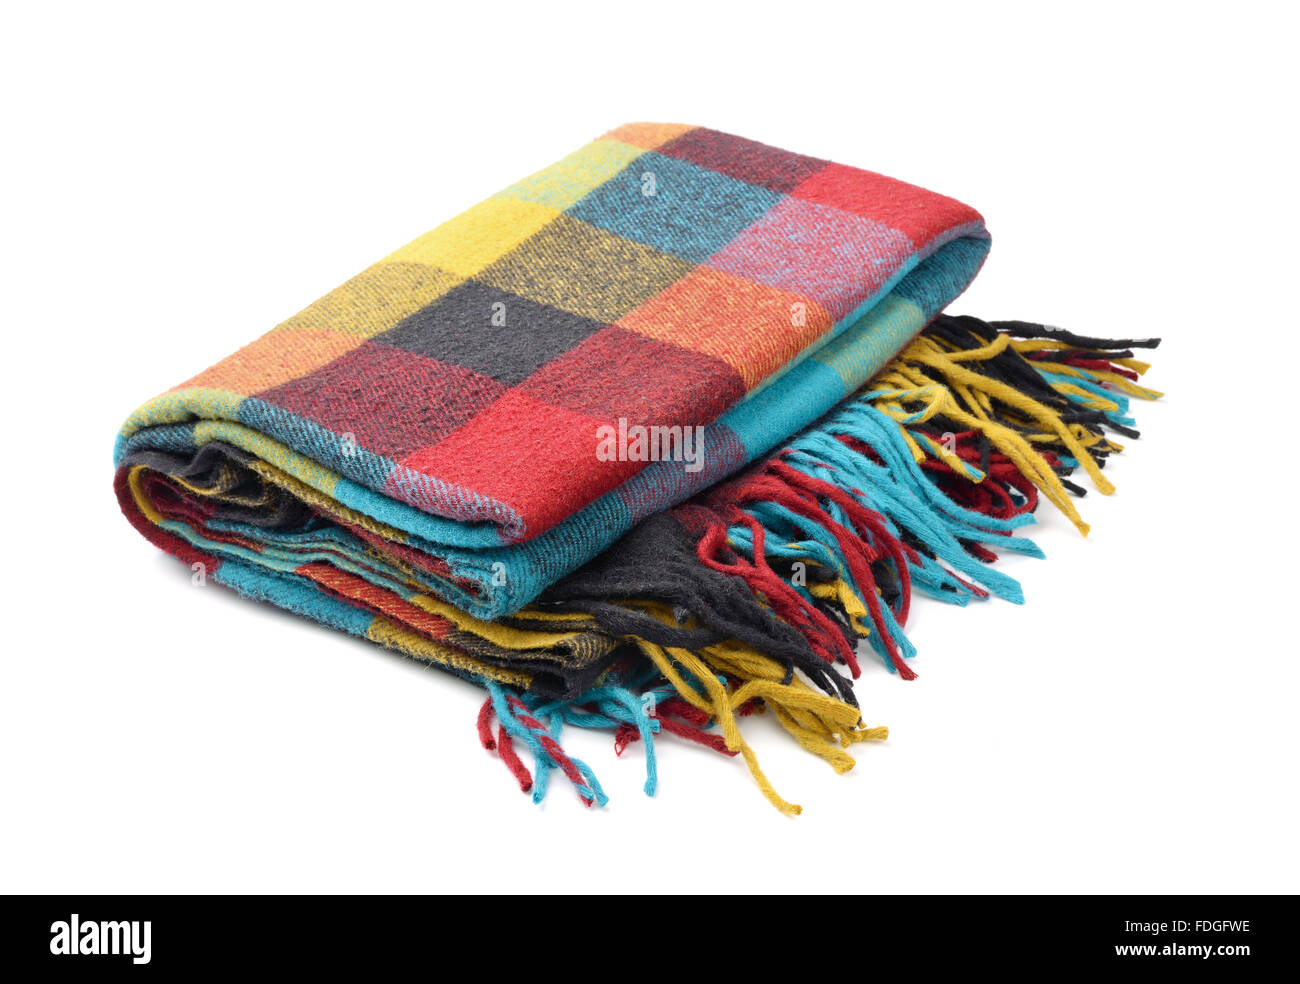 Plaid wool blanket isolated on white - Stock Image